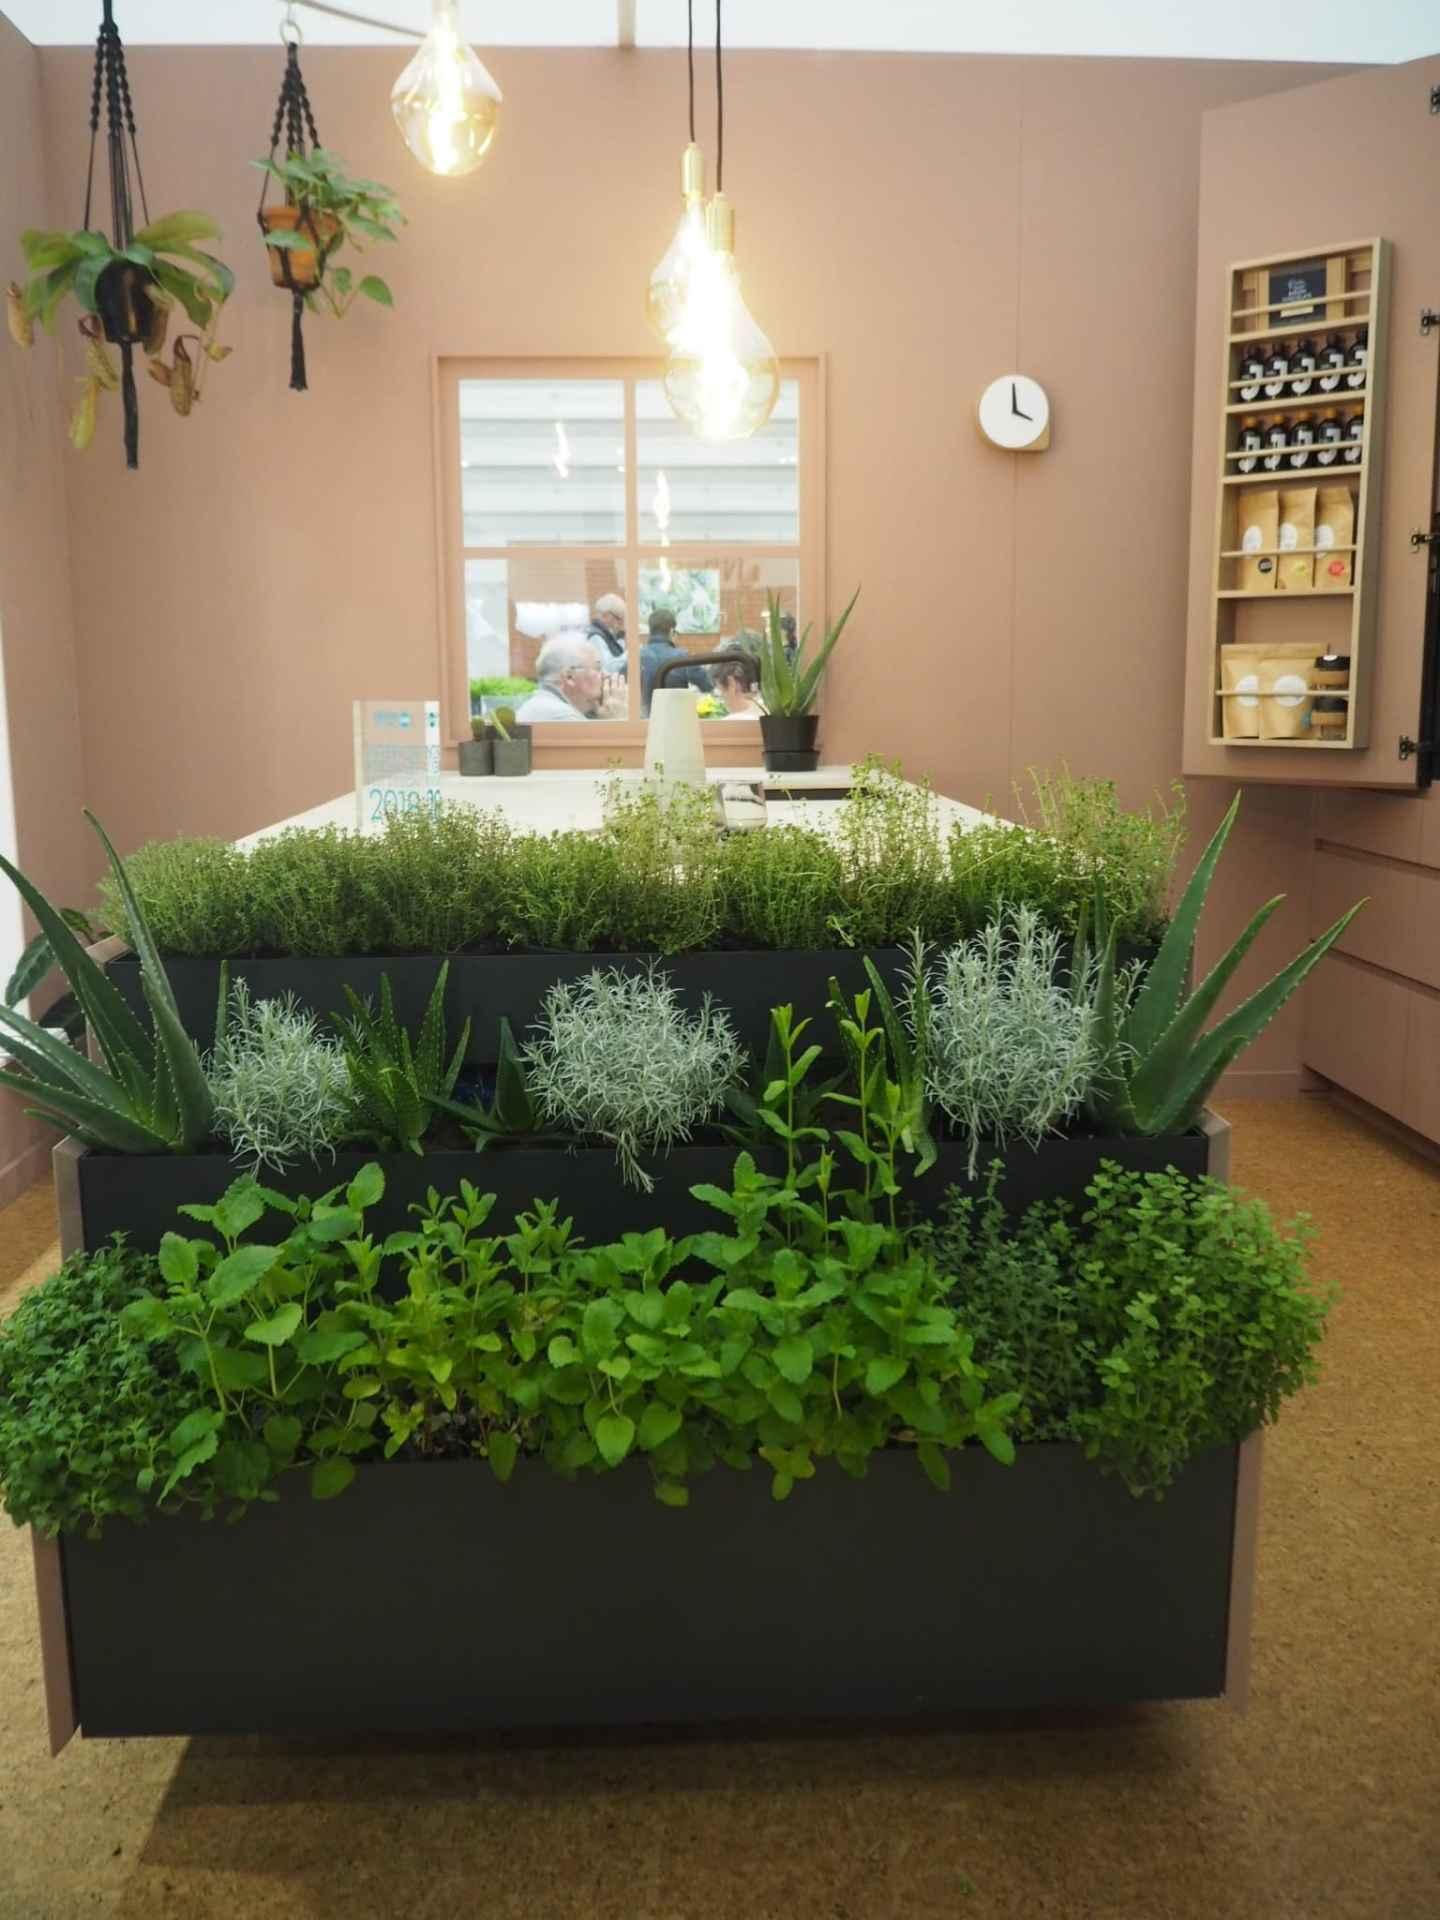 The herb garden and cork flooring